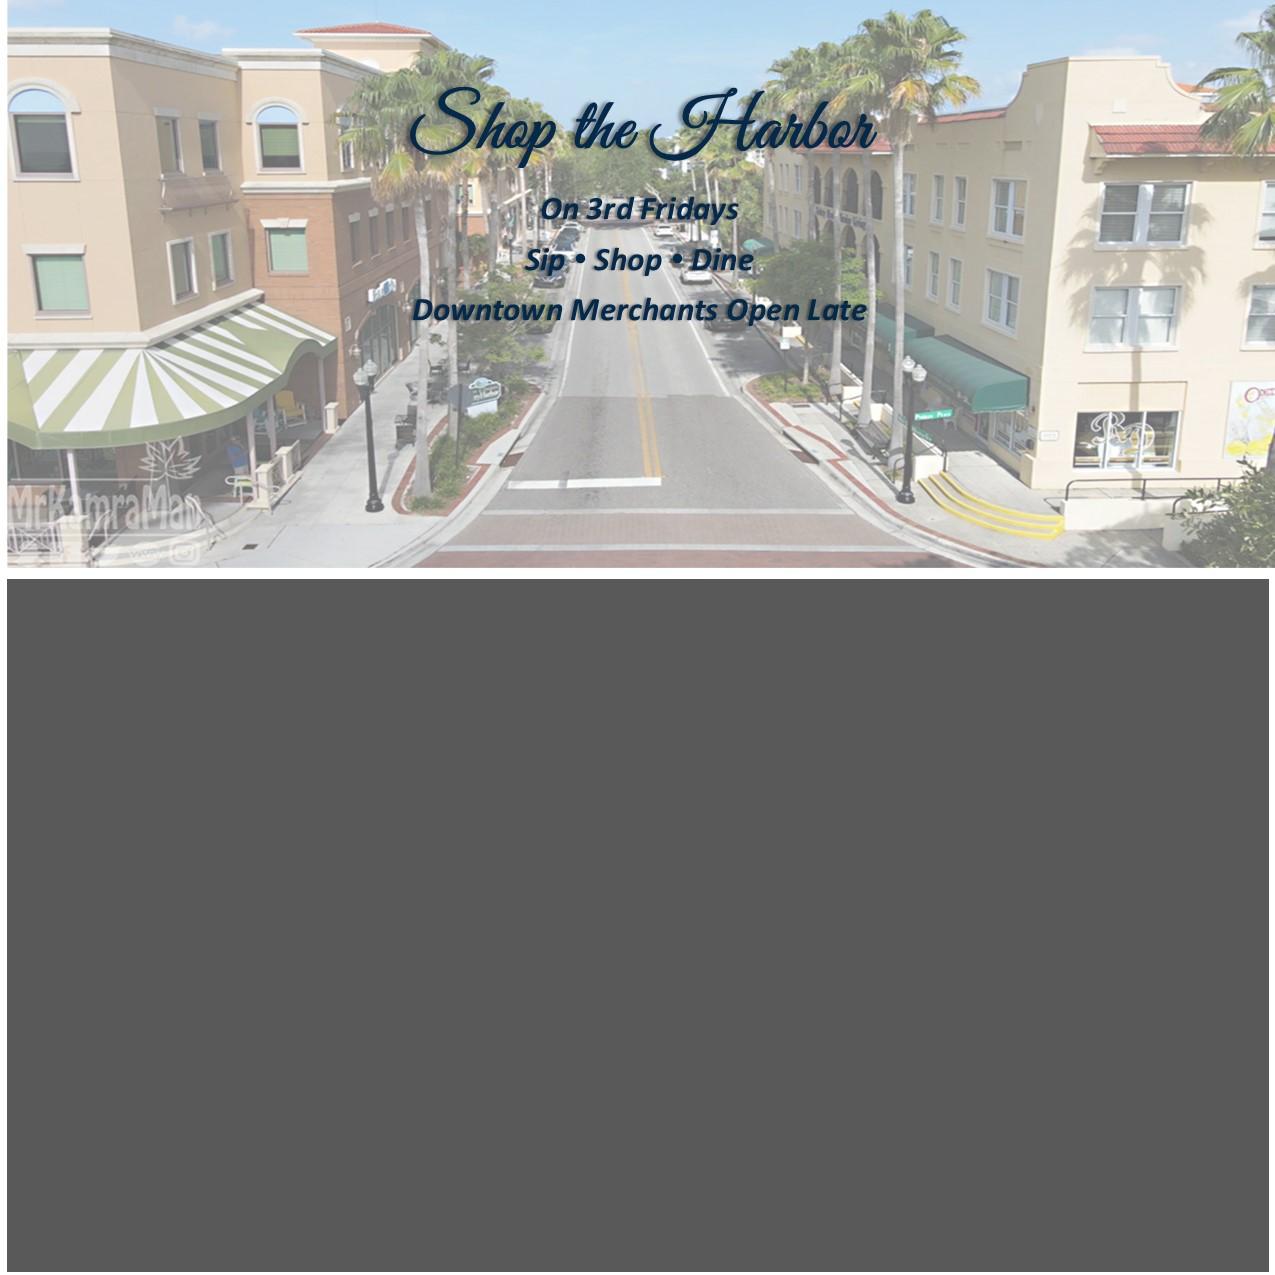 Shop-the-Harbor-3rd-Fridays-Website.jpg